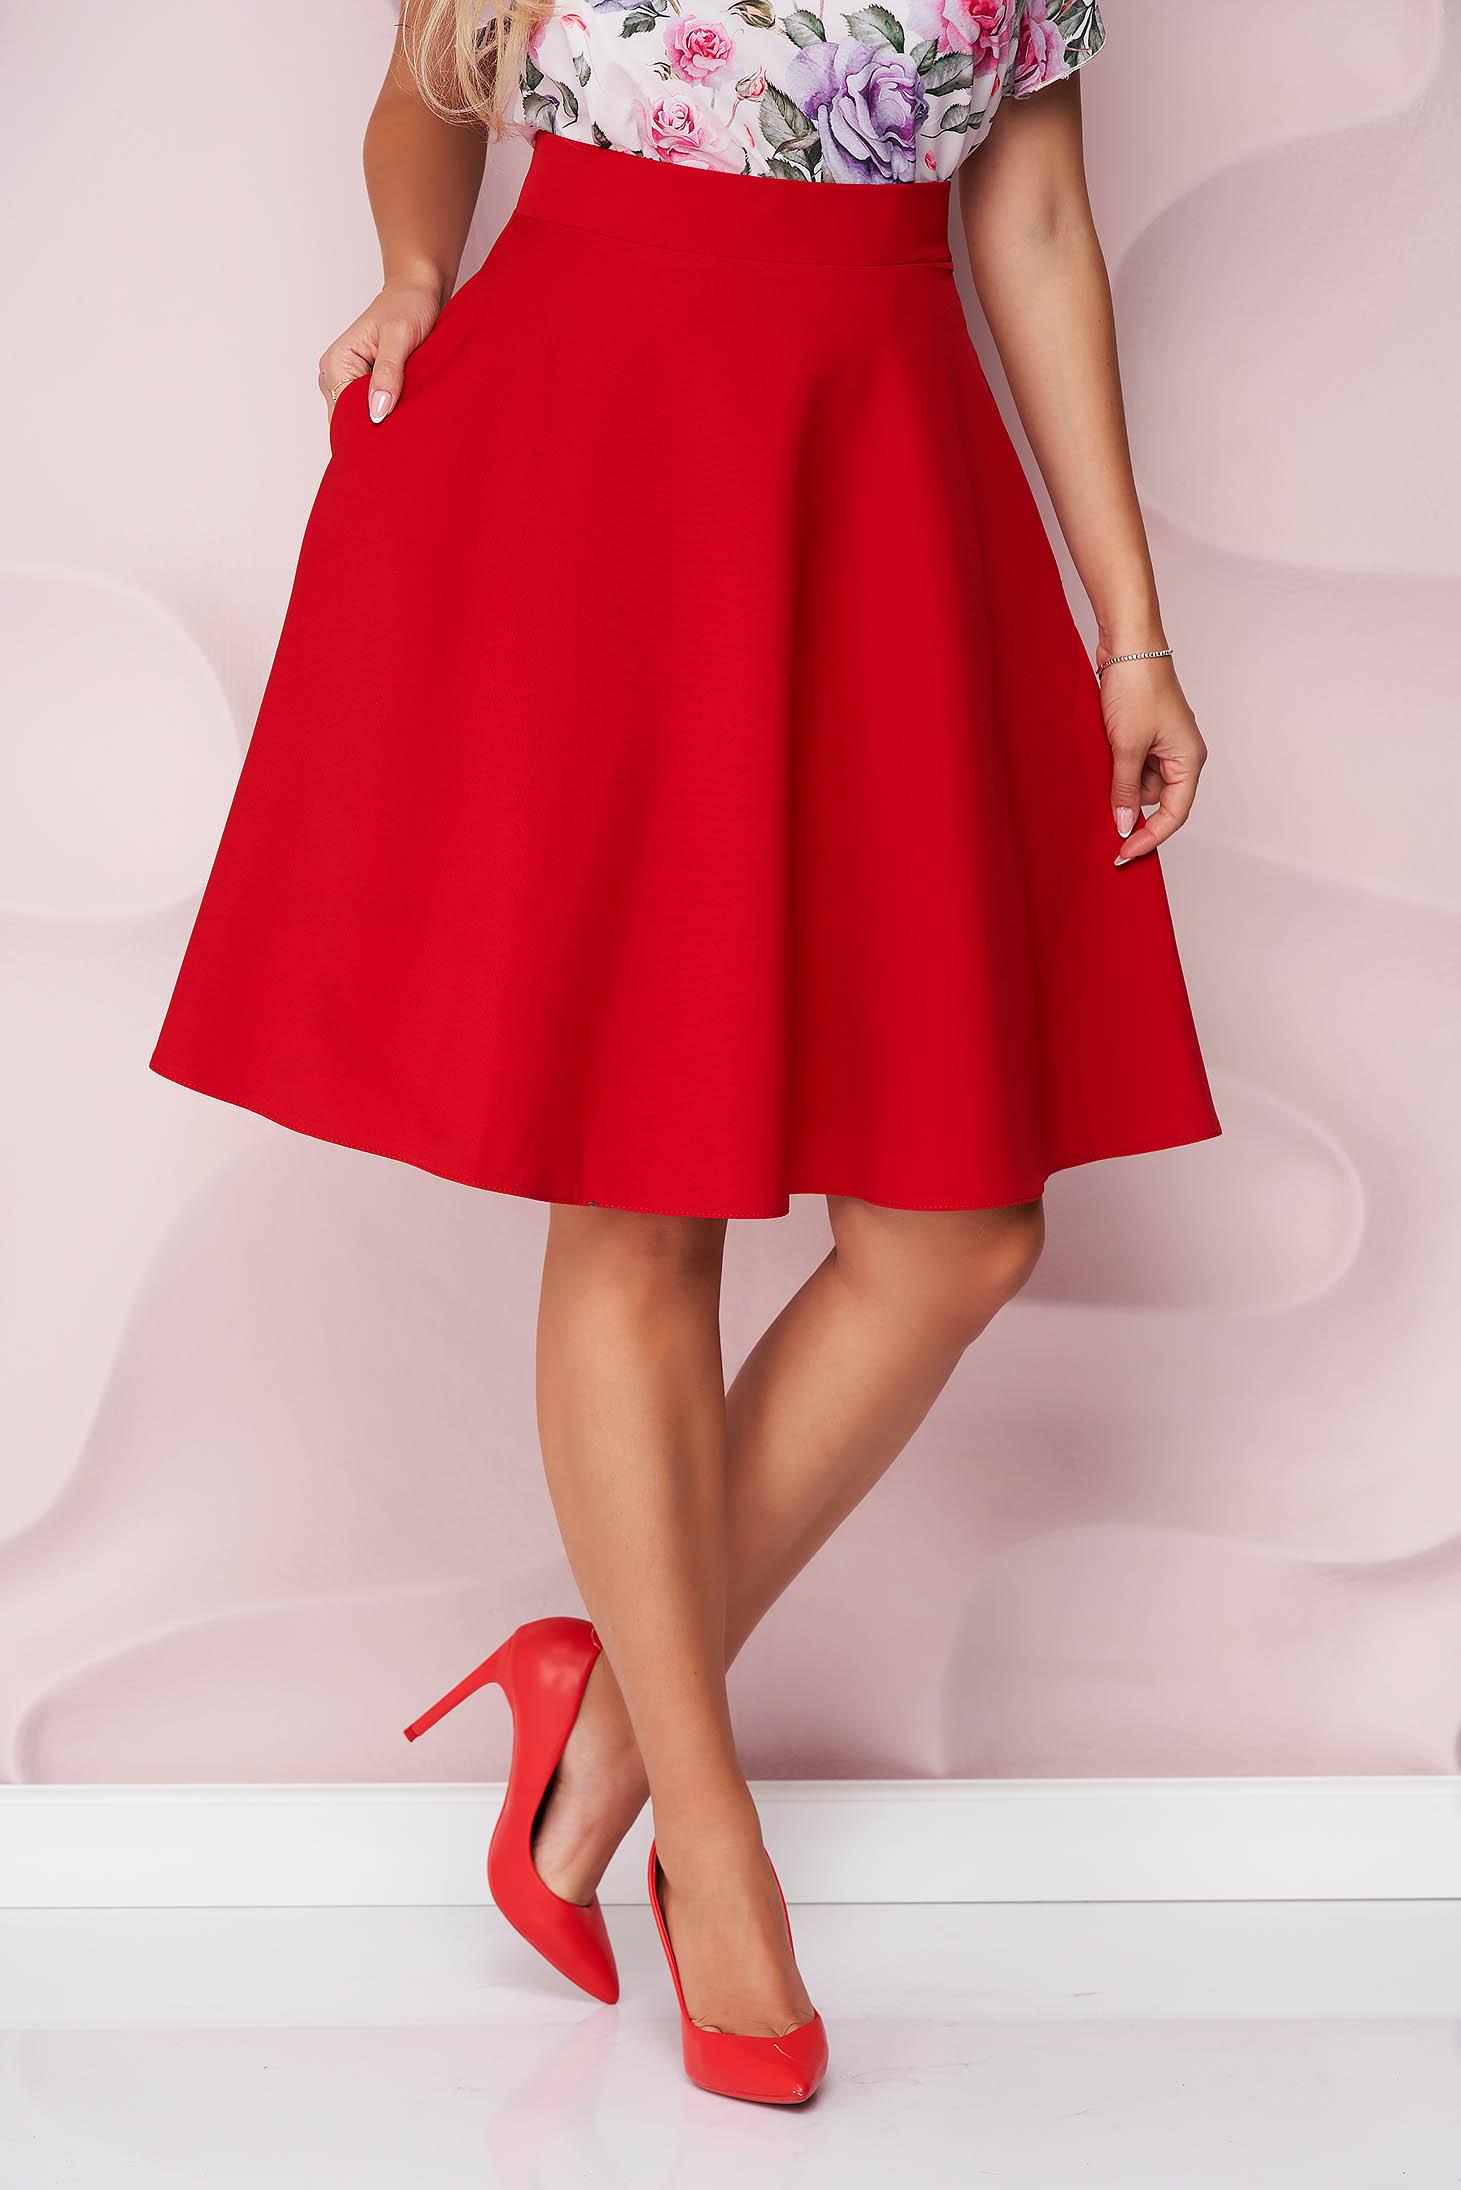 Fusta StarShinerS rosie office midi in clos din stofa usor elastica cu talie inalta si buzunare